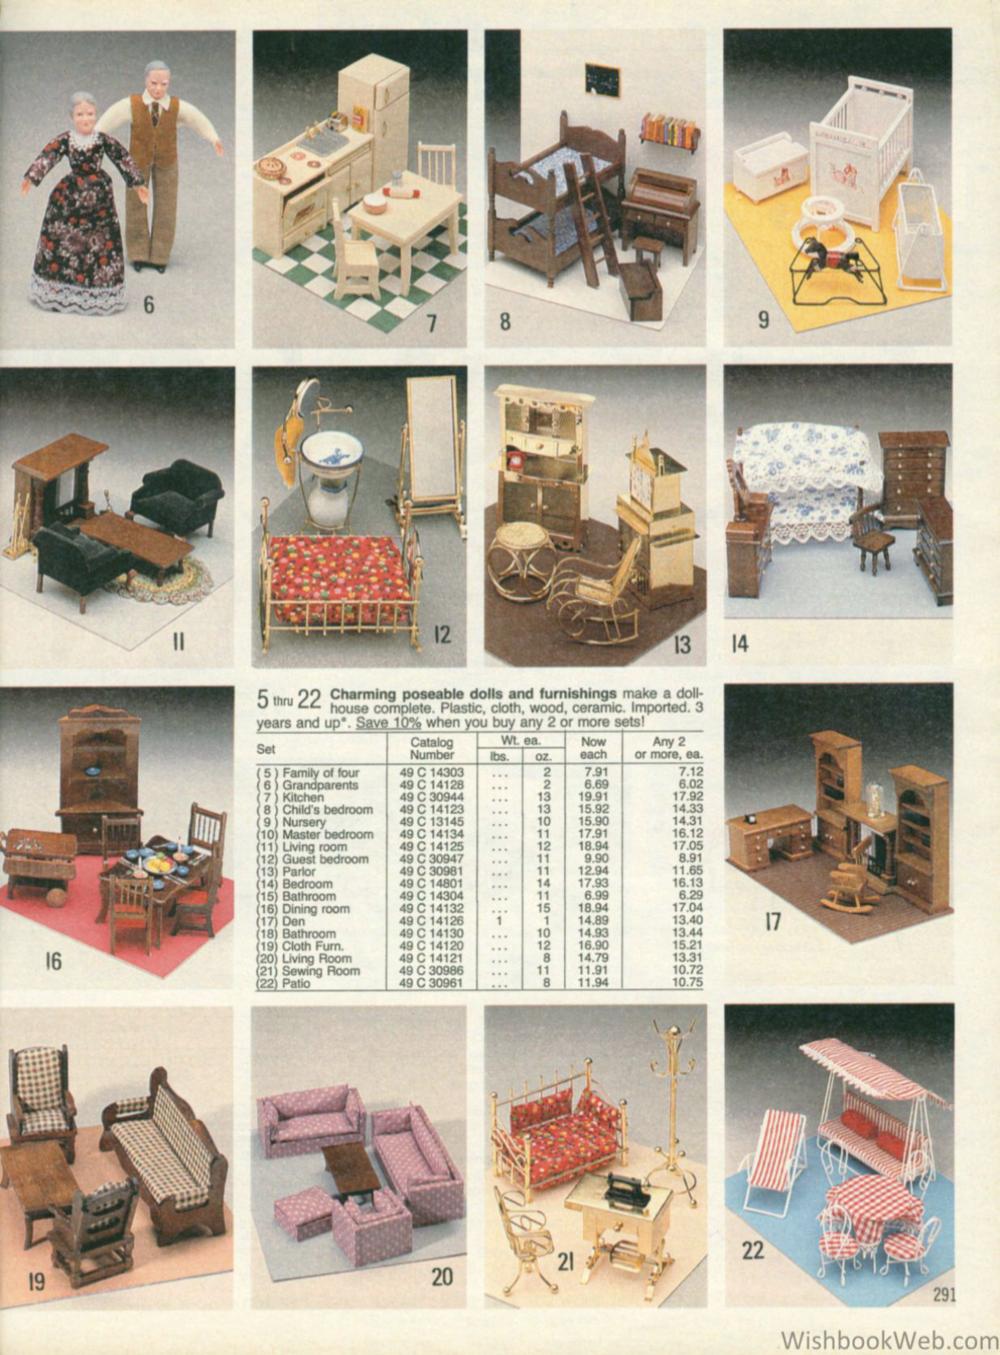 Nikki - Dollhouse Stuff - wishbookweb.com